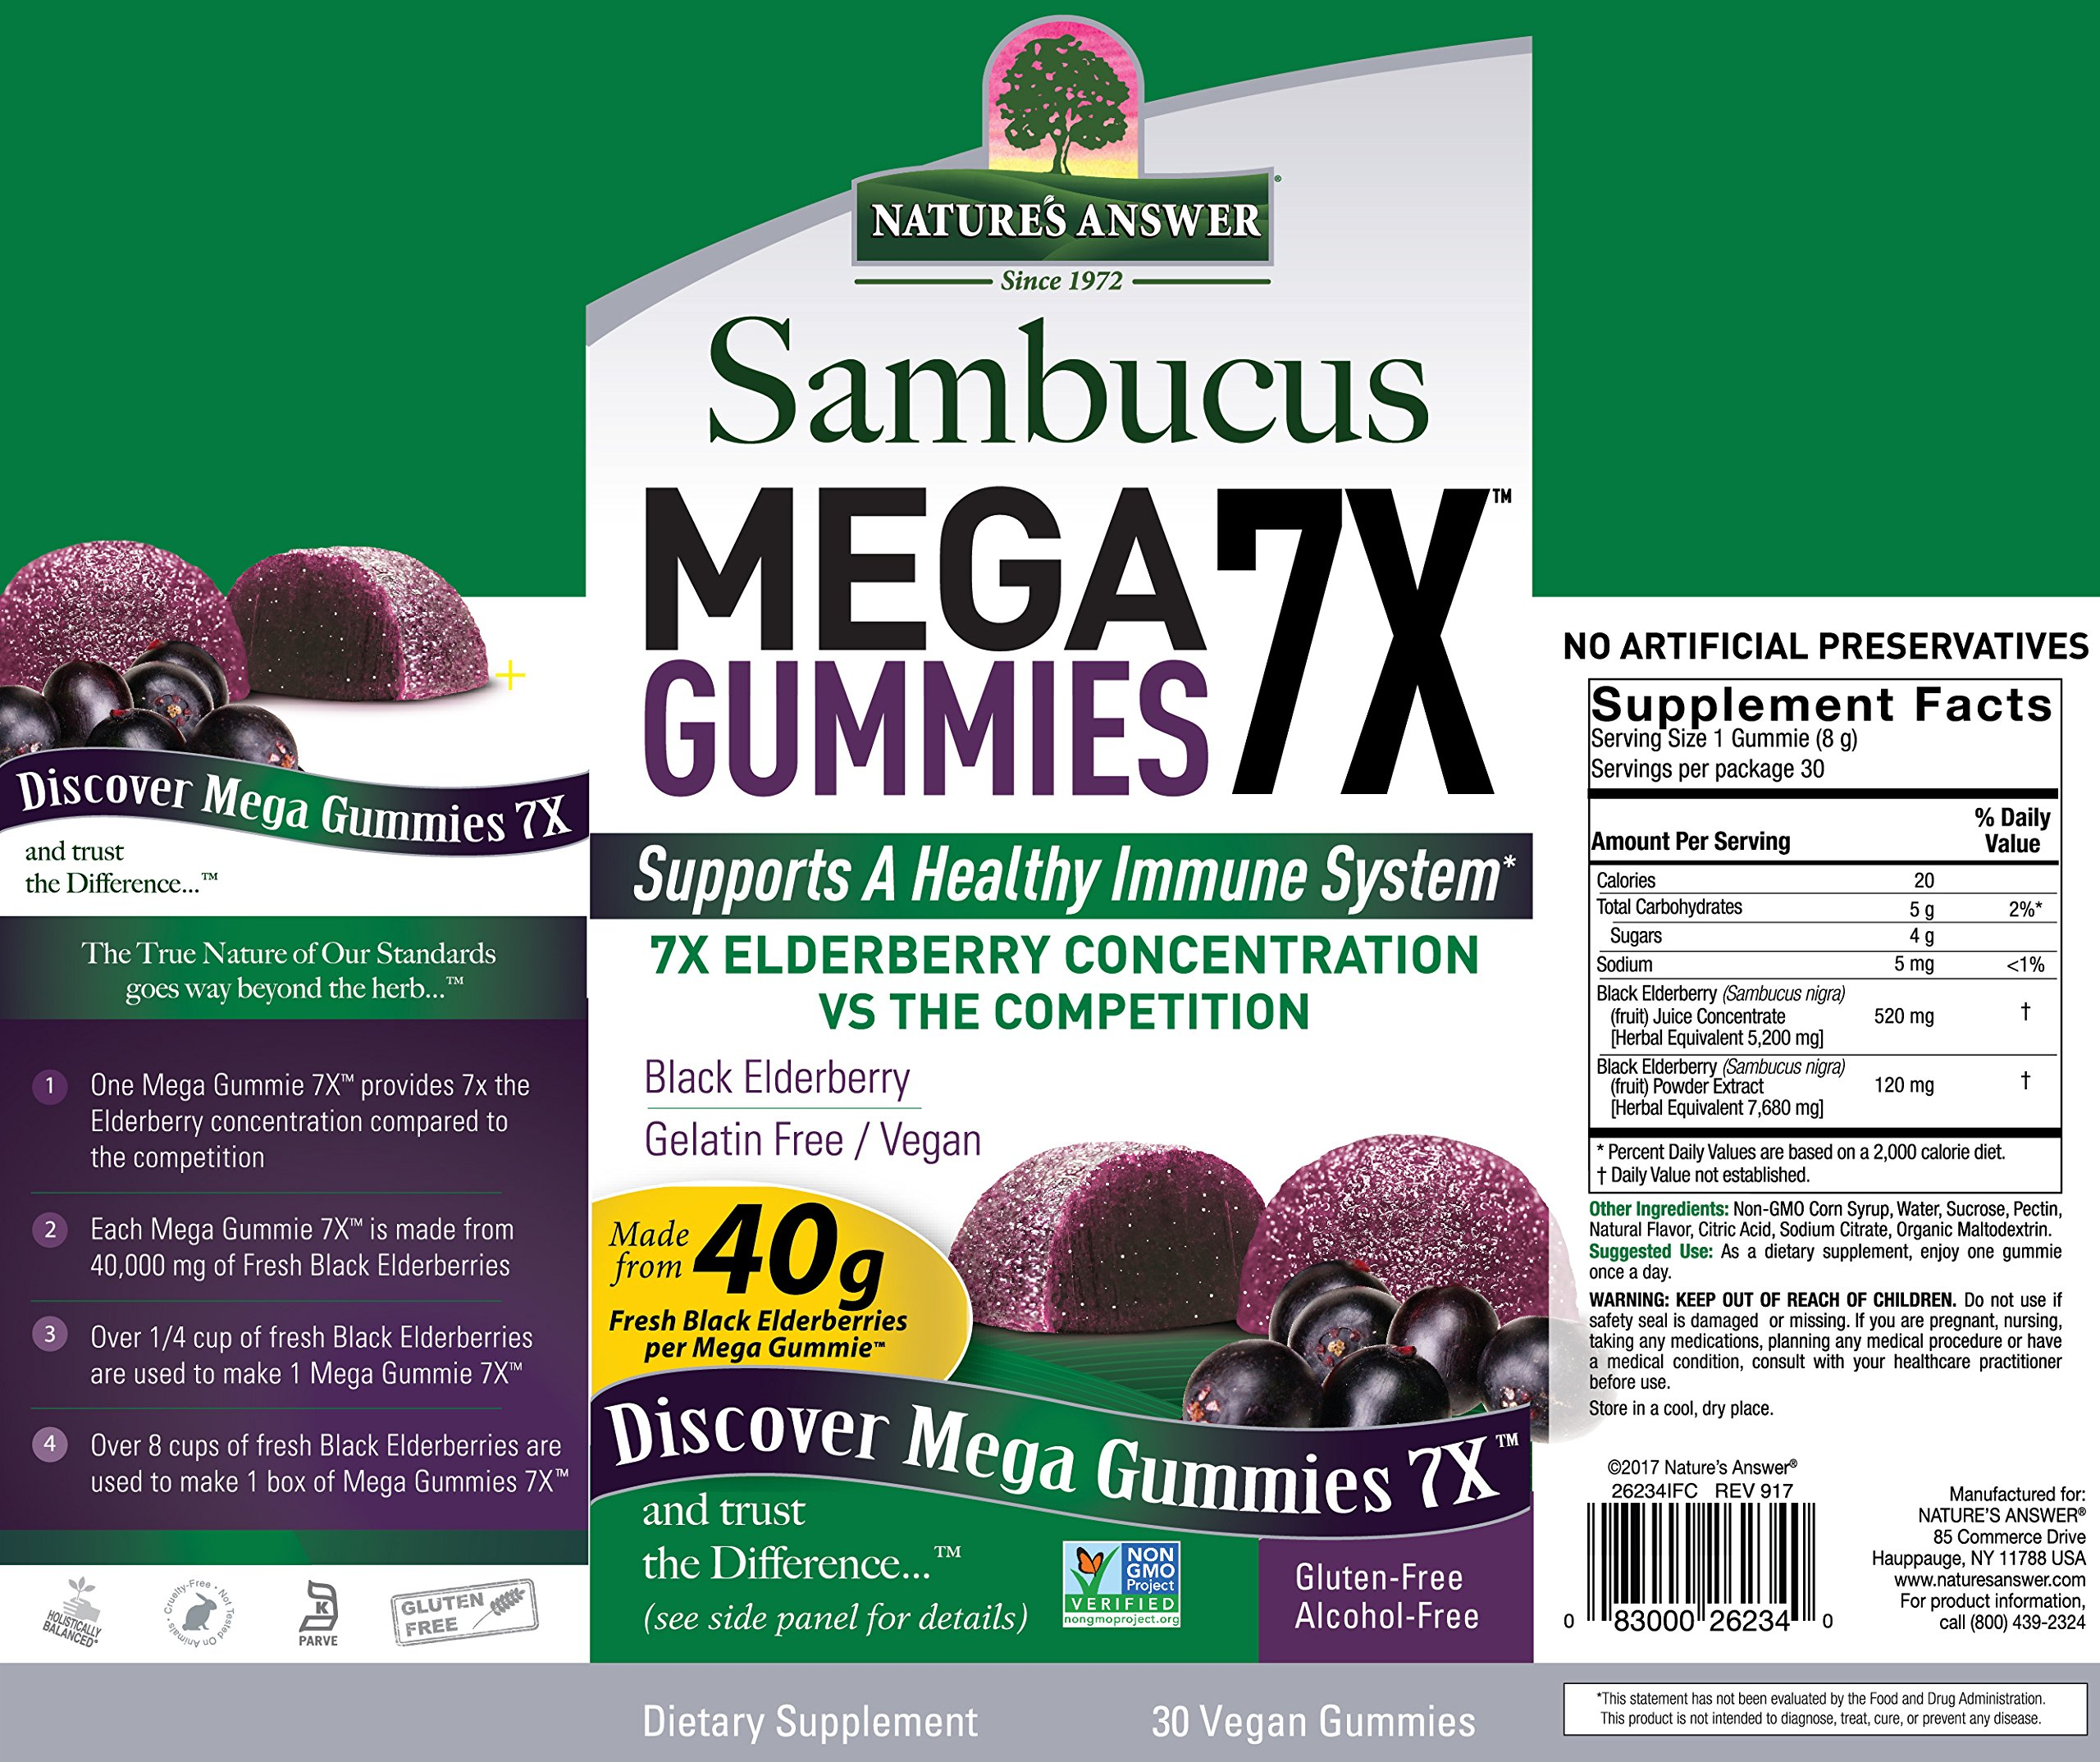 Nature's Answer Sambucus Mega Black Elderberry Gummies, 7X More Elderberry Concentration, 60 Count (2 Pack) by Nature's Answer (Image #3)